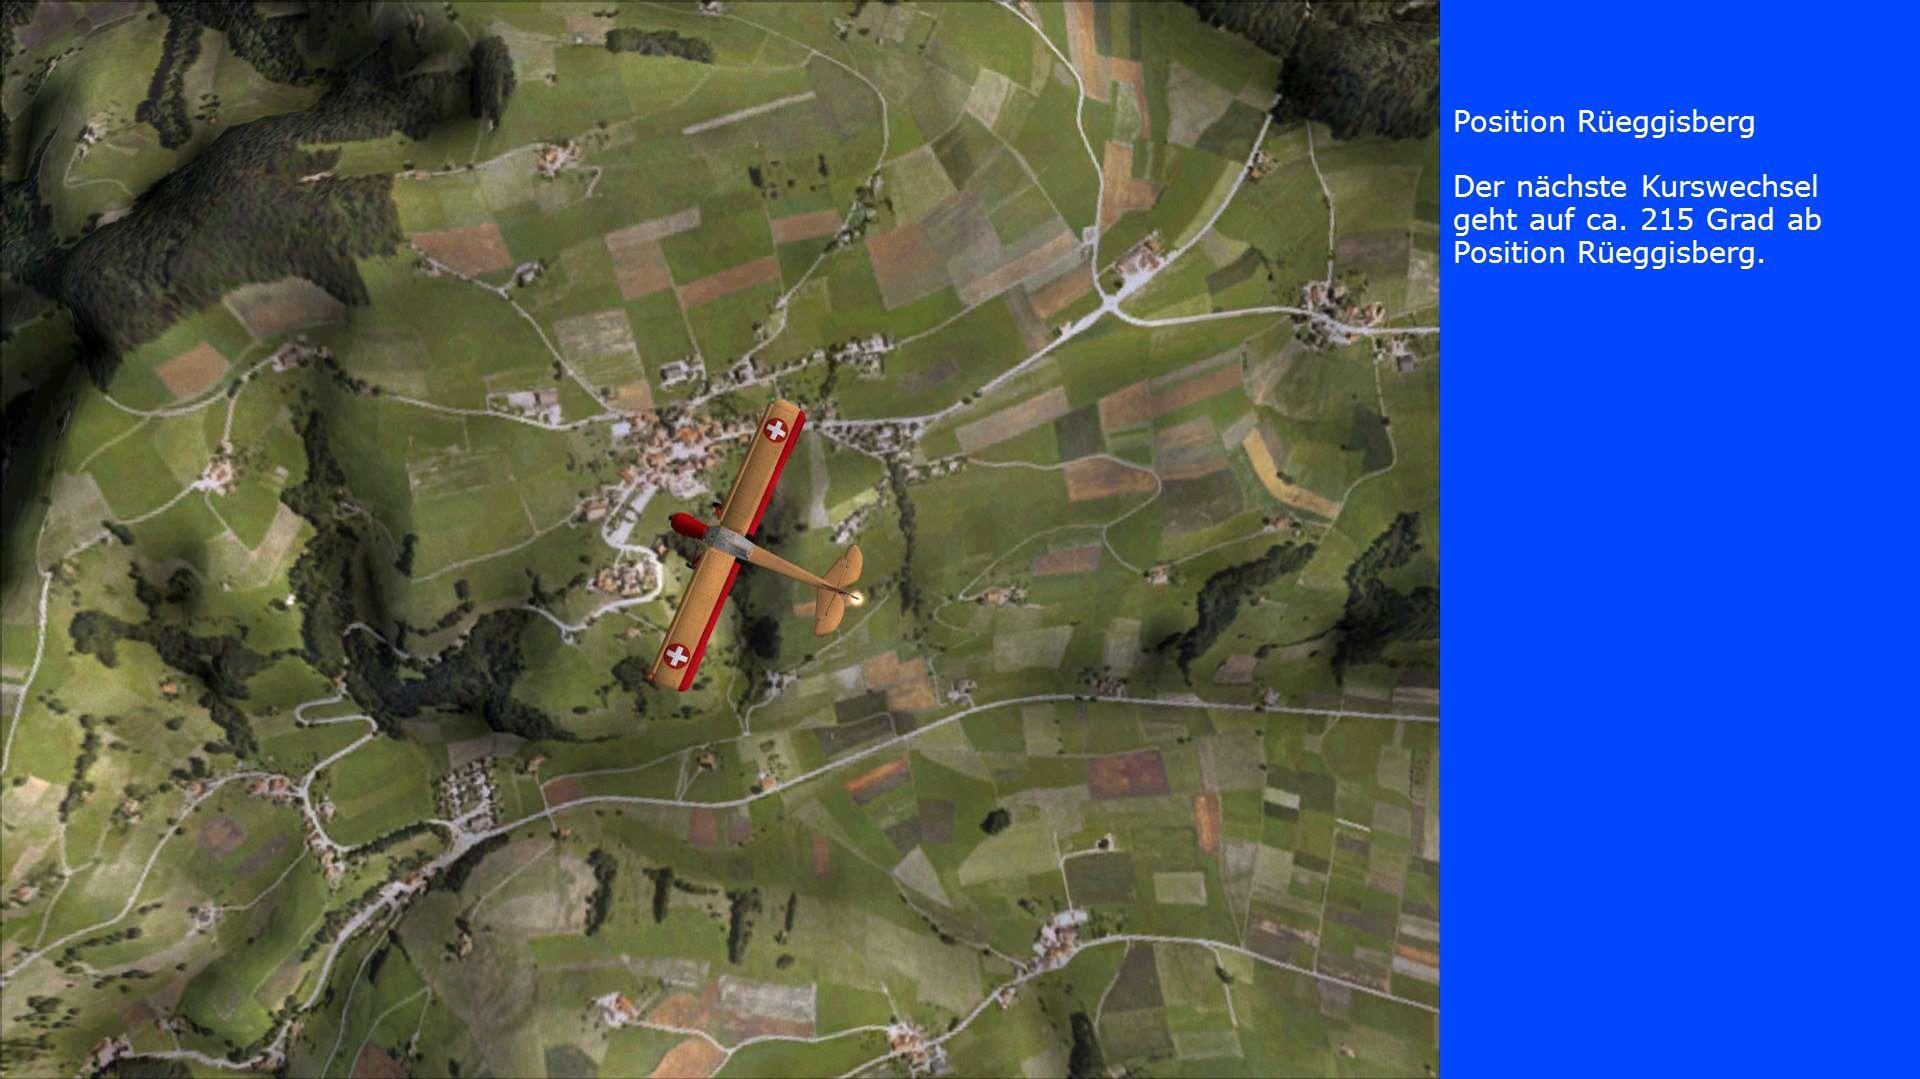 Position Rüeggisberg Der nächste Kurswechsel geht auf ca. 215 Grad ab Position Rüeggisberg.